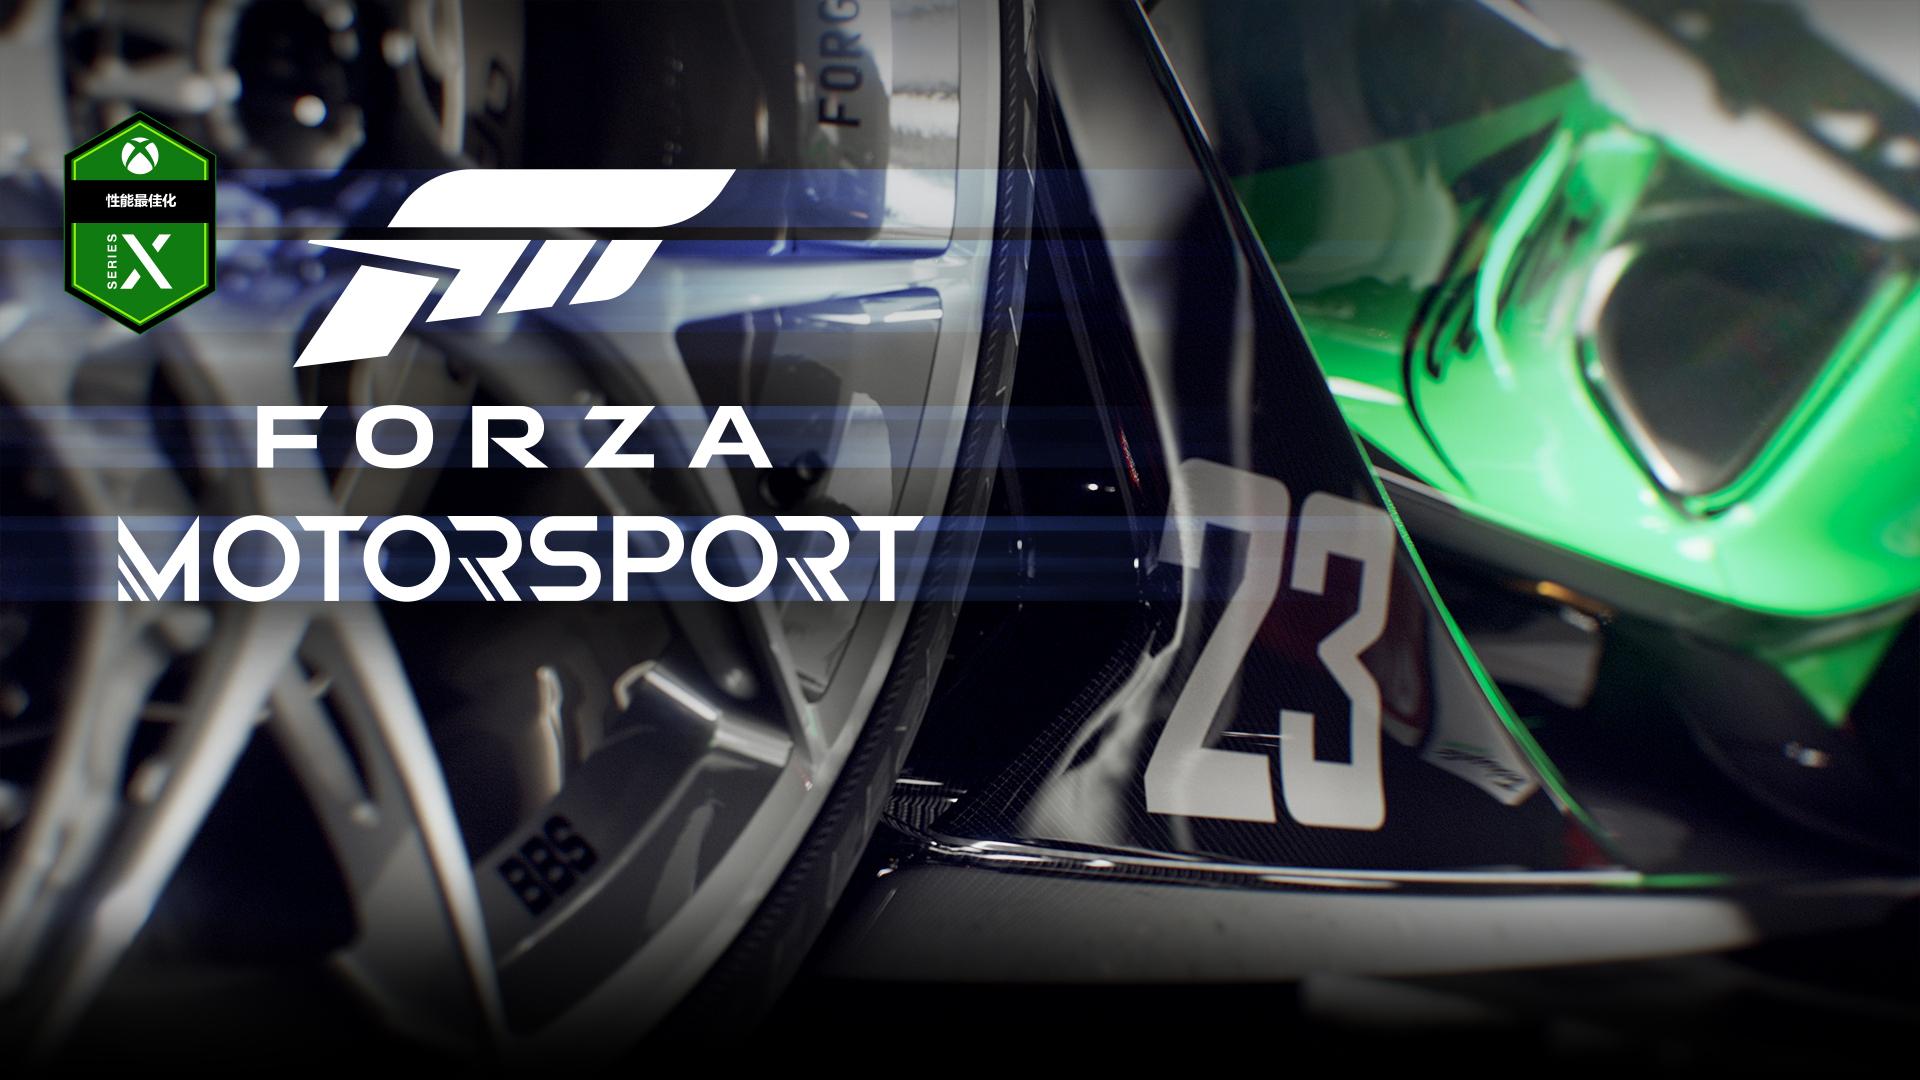 Xbox Series X 性能最佳化,Forza Motorsport,輪子的特寫